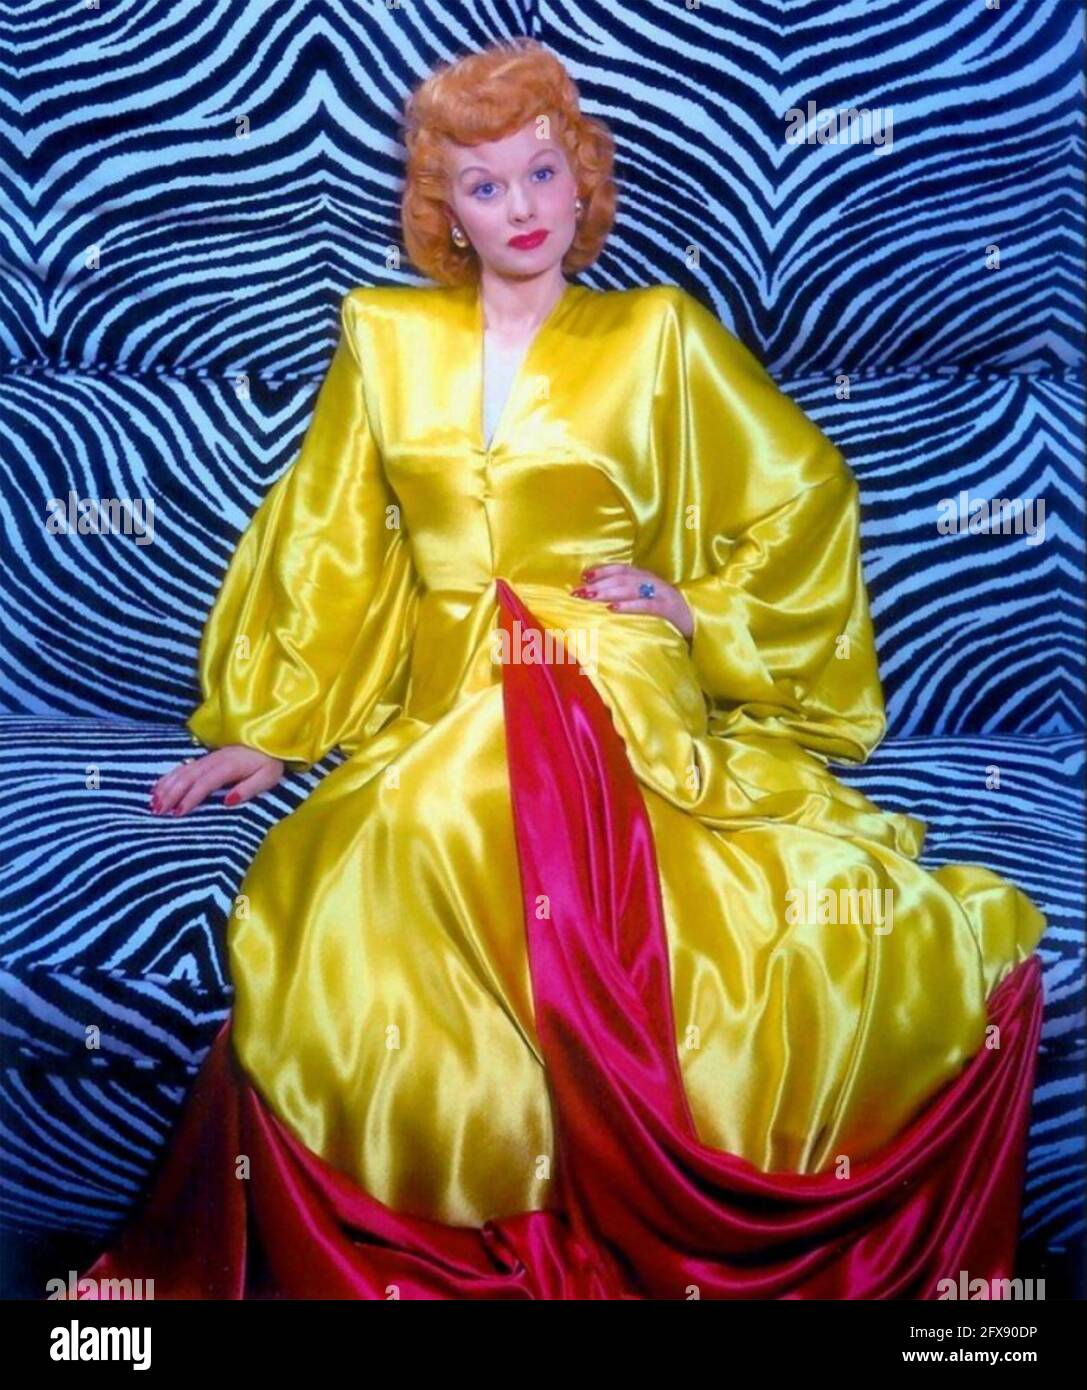 LUCILLE BALL (1911-1989) actrice et productrice américaine vers 1945 Banque D'Images